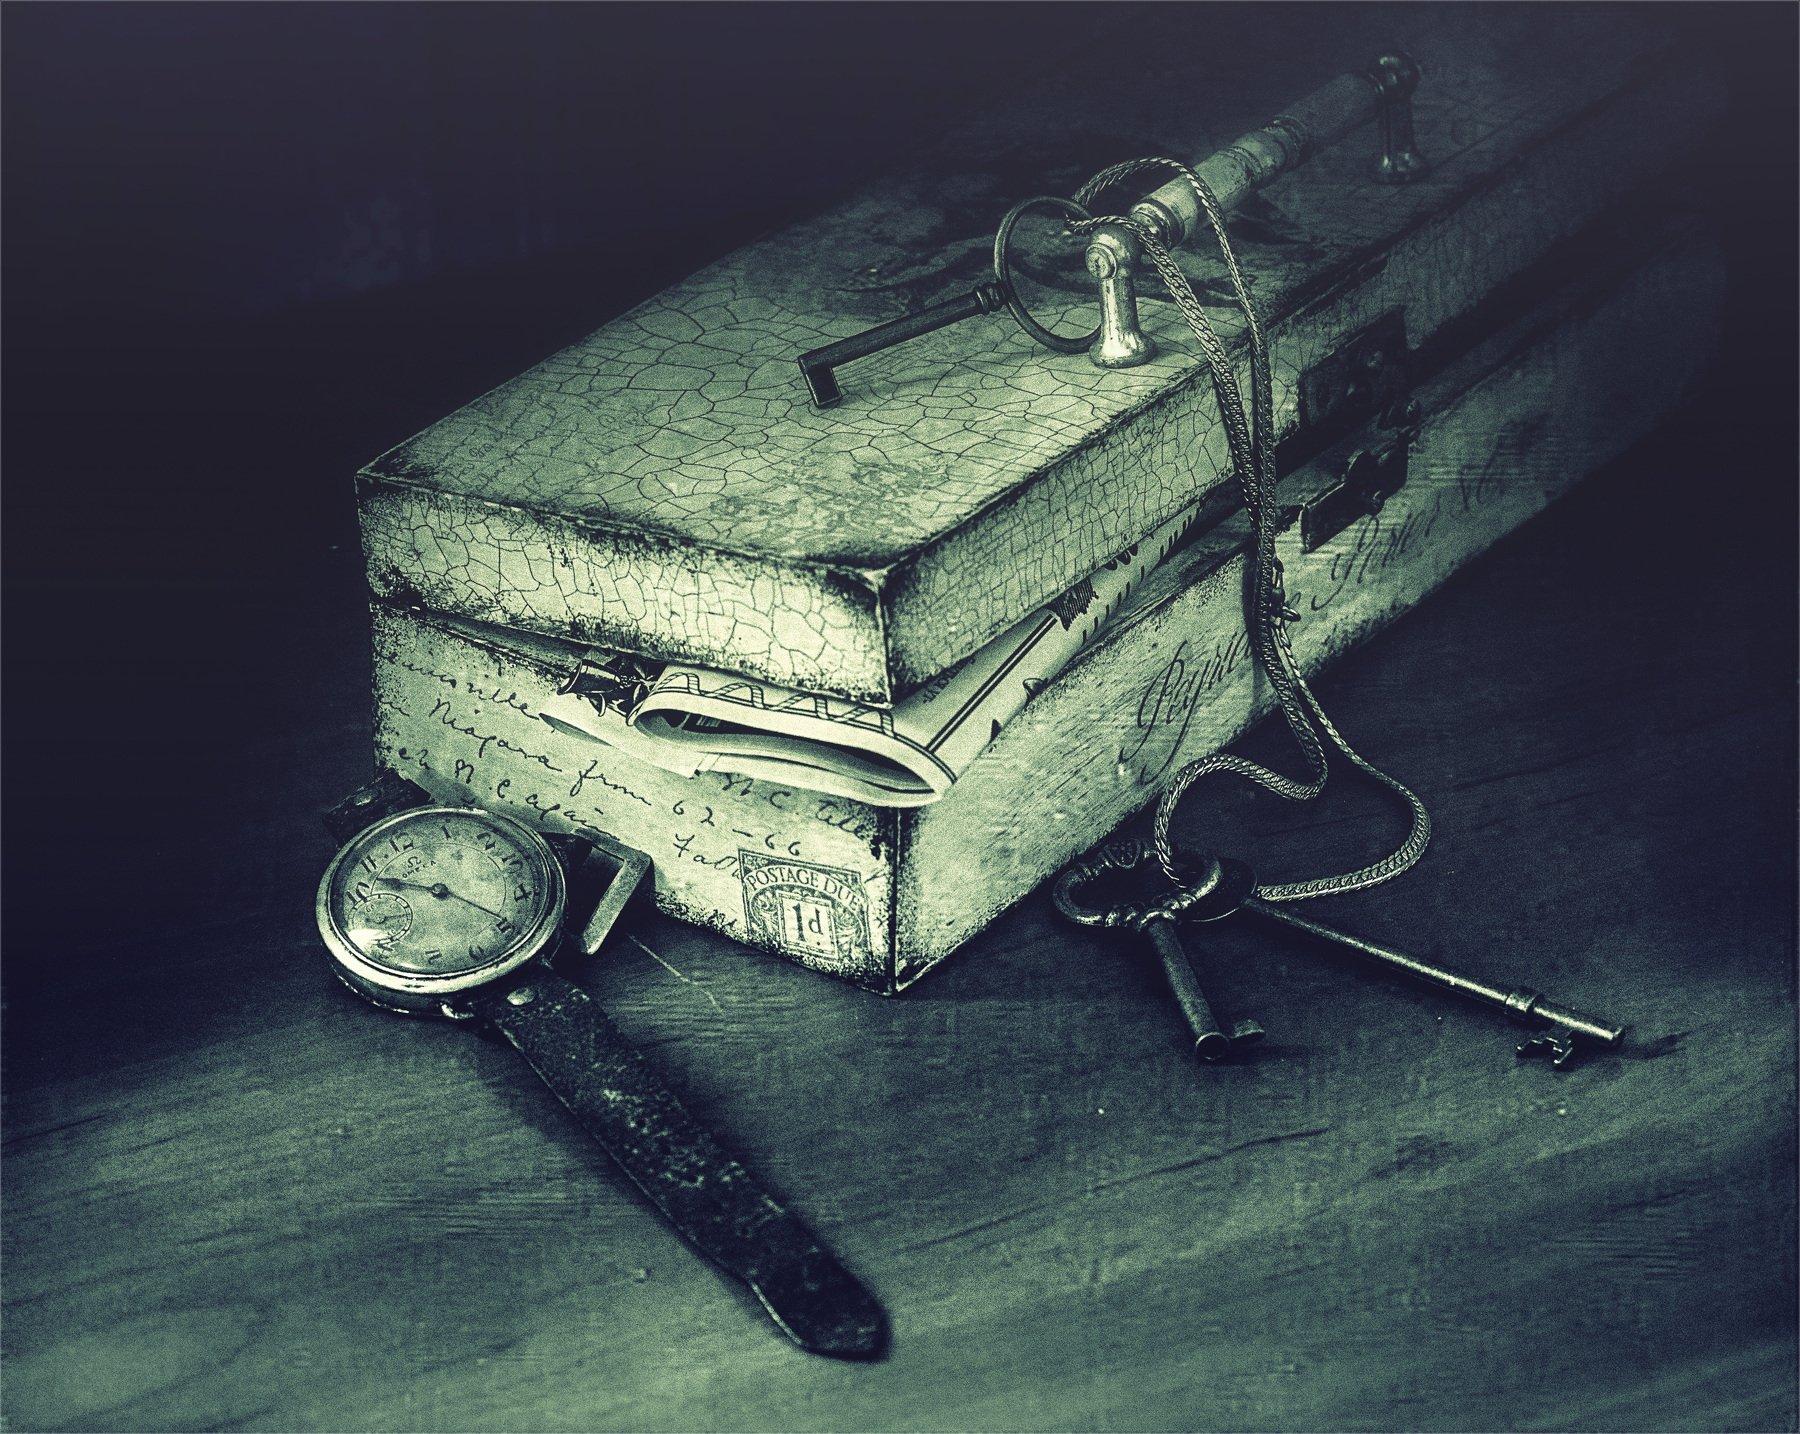 still life, натюрморт, винтаж, ретро,  шкатулка, часы, ключи, Михаил MSH